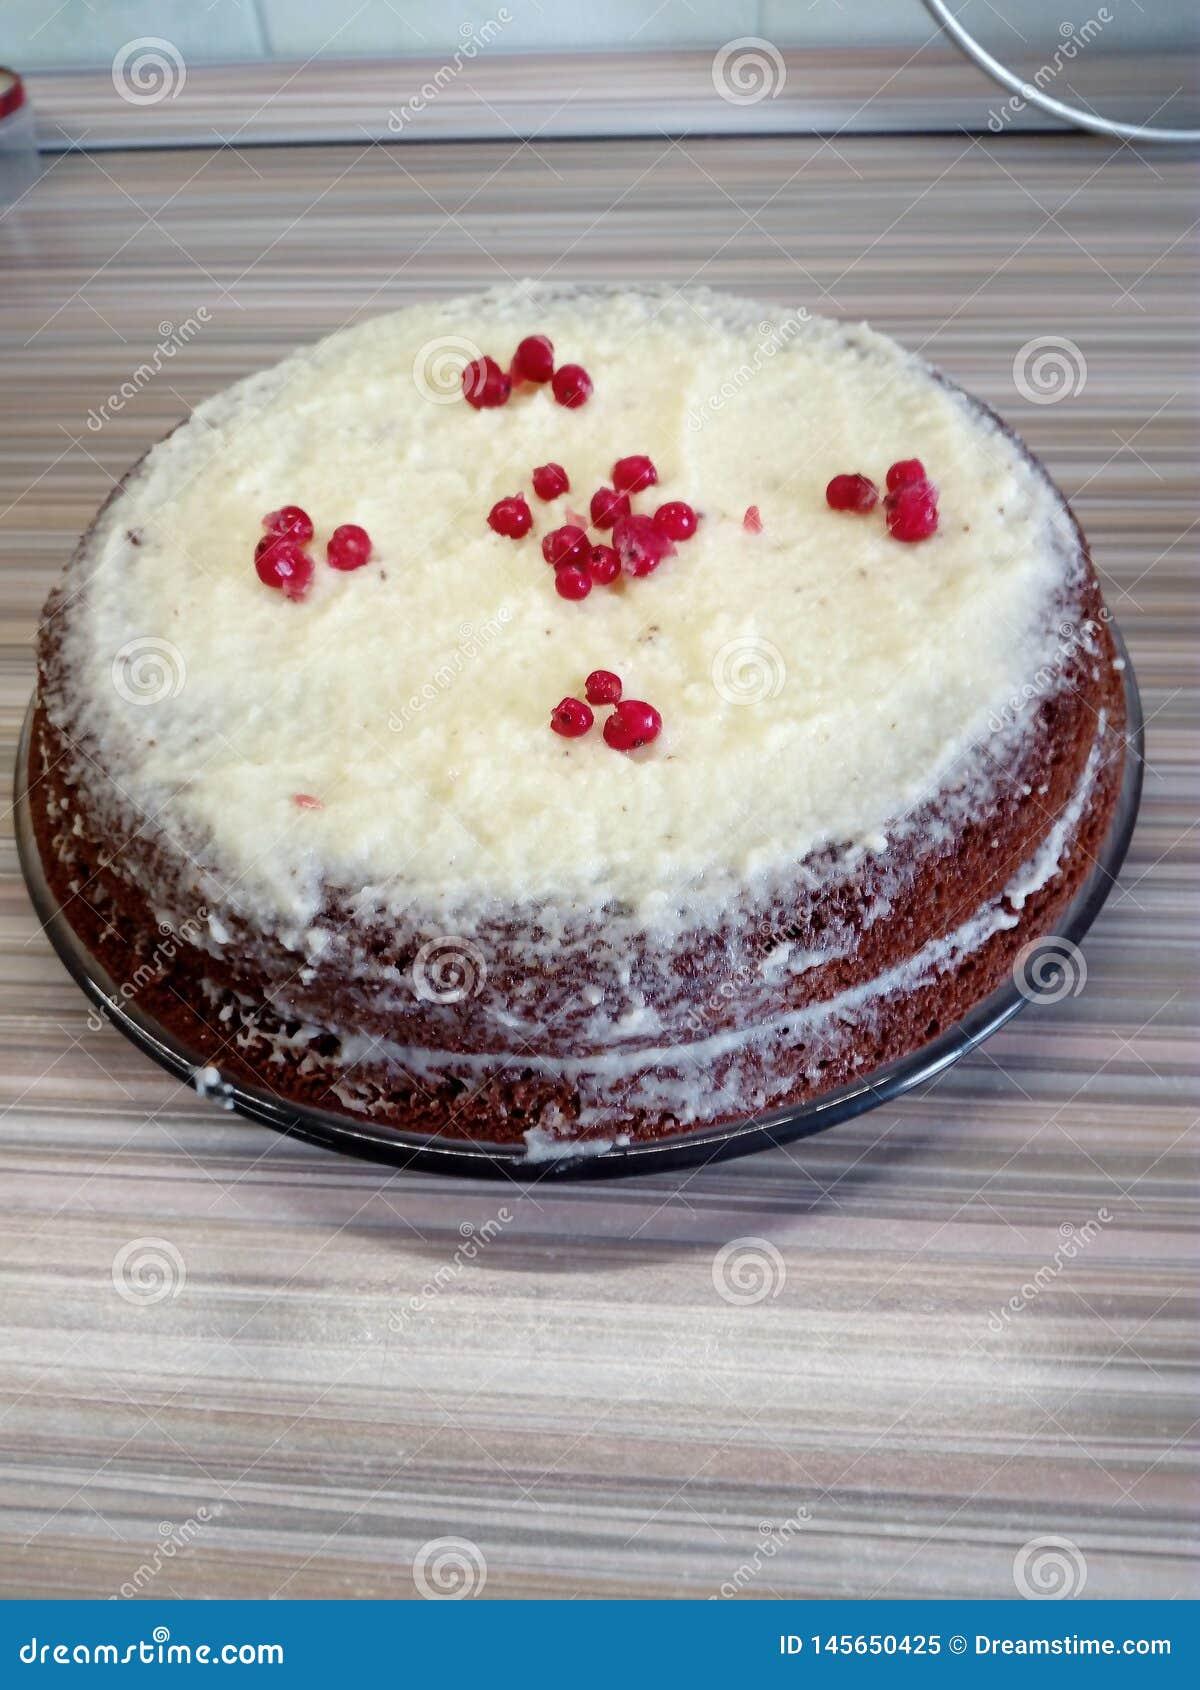 Domowej roboty tort z ?mietank? i jagodami